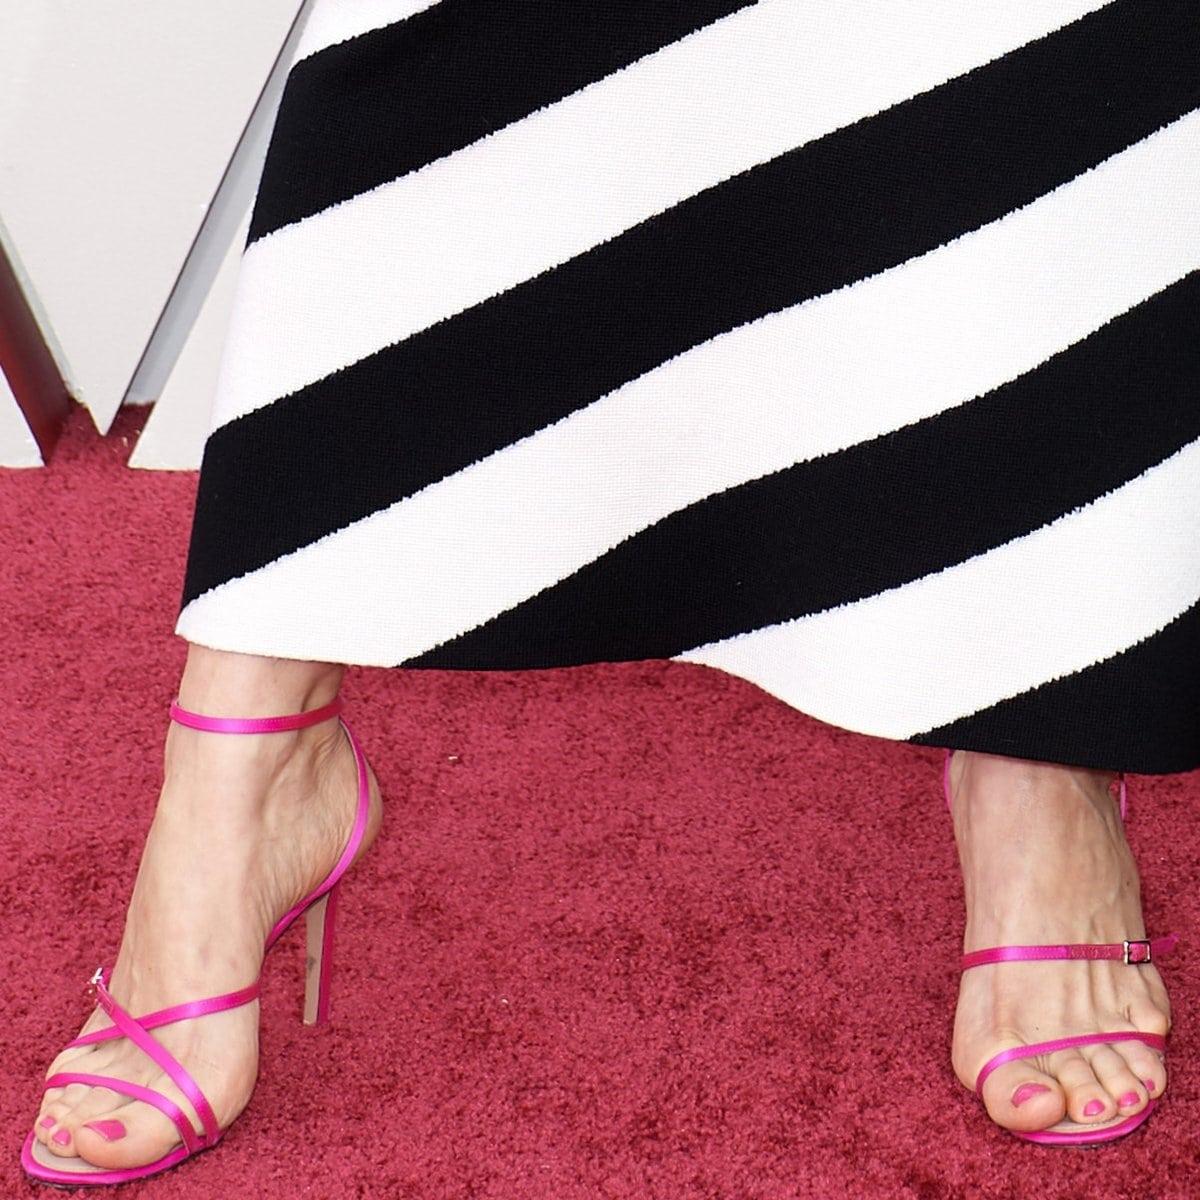 Elvira Lind shows off her feet in pink high heels